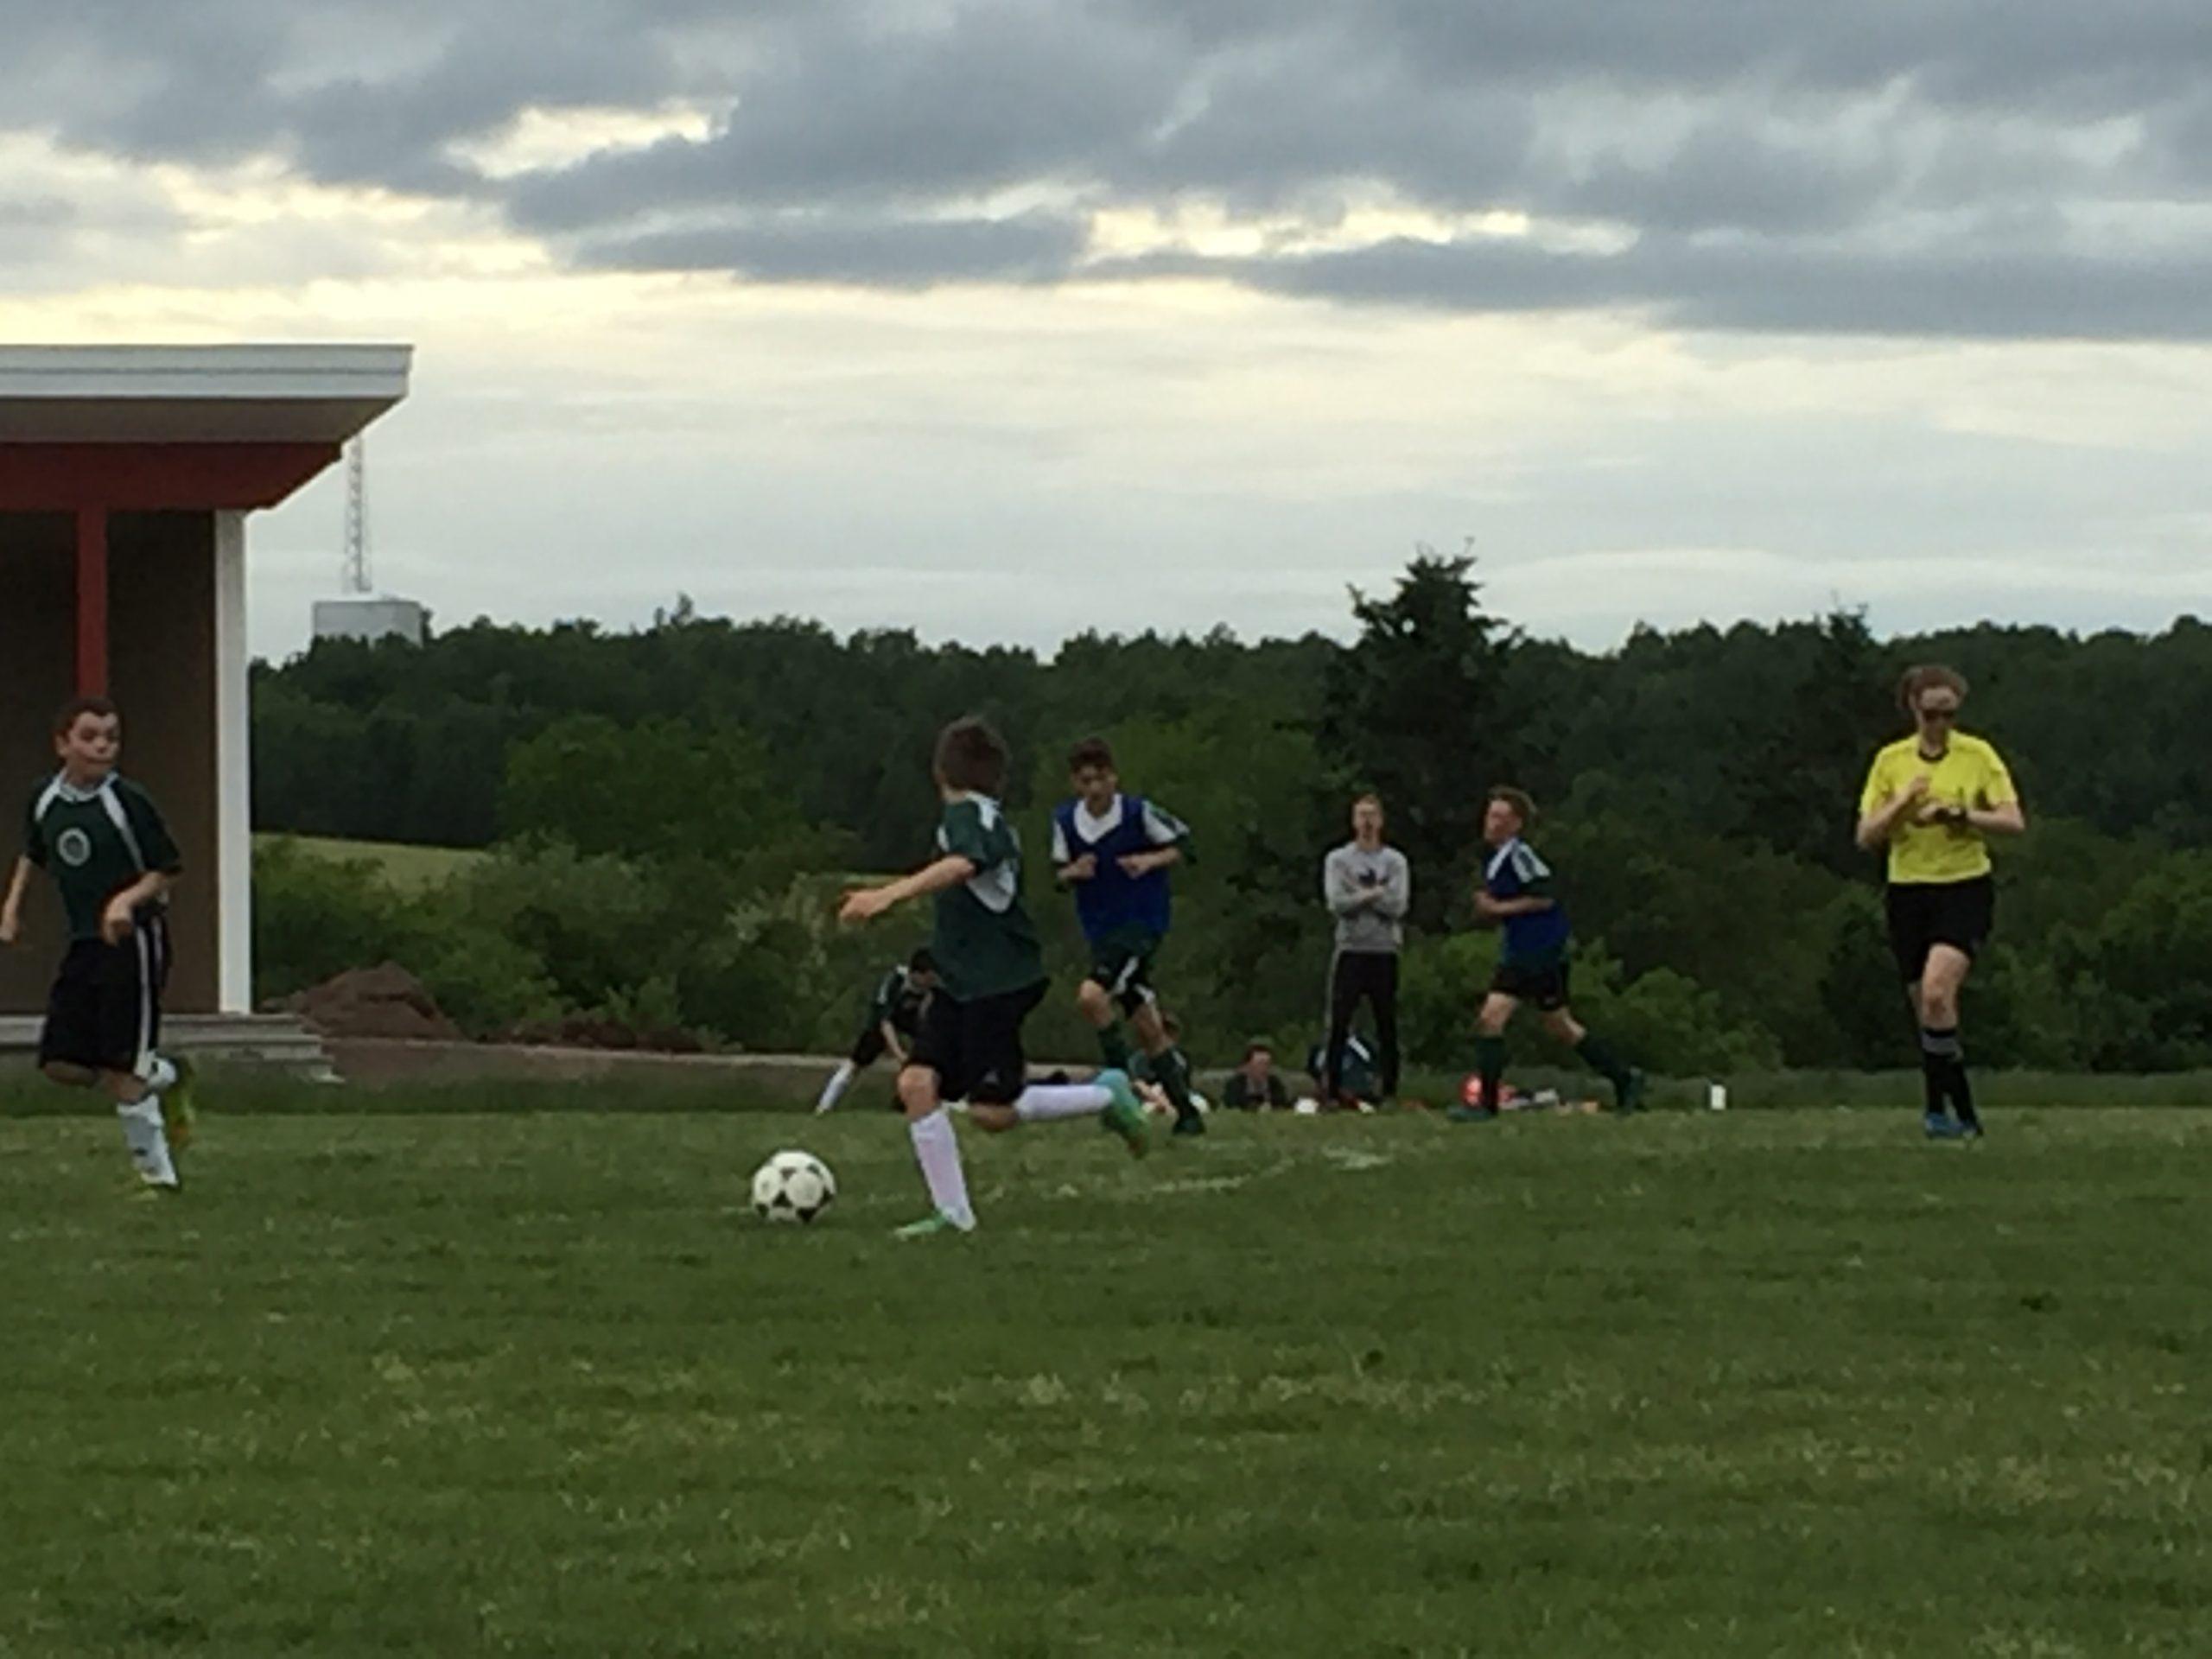 Highland Soccer League/U13 boys results (from Antigonish Thursday)